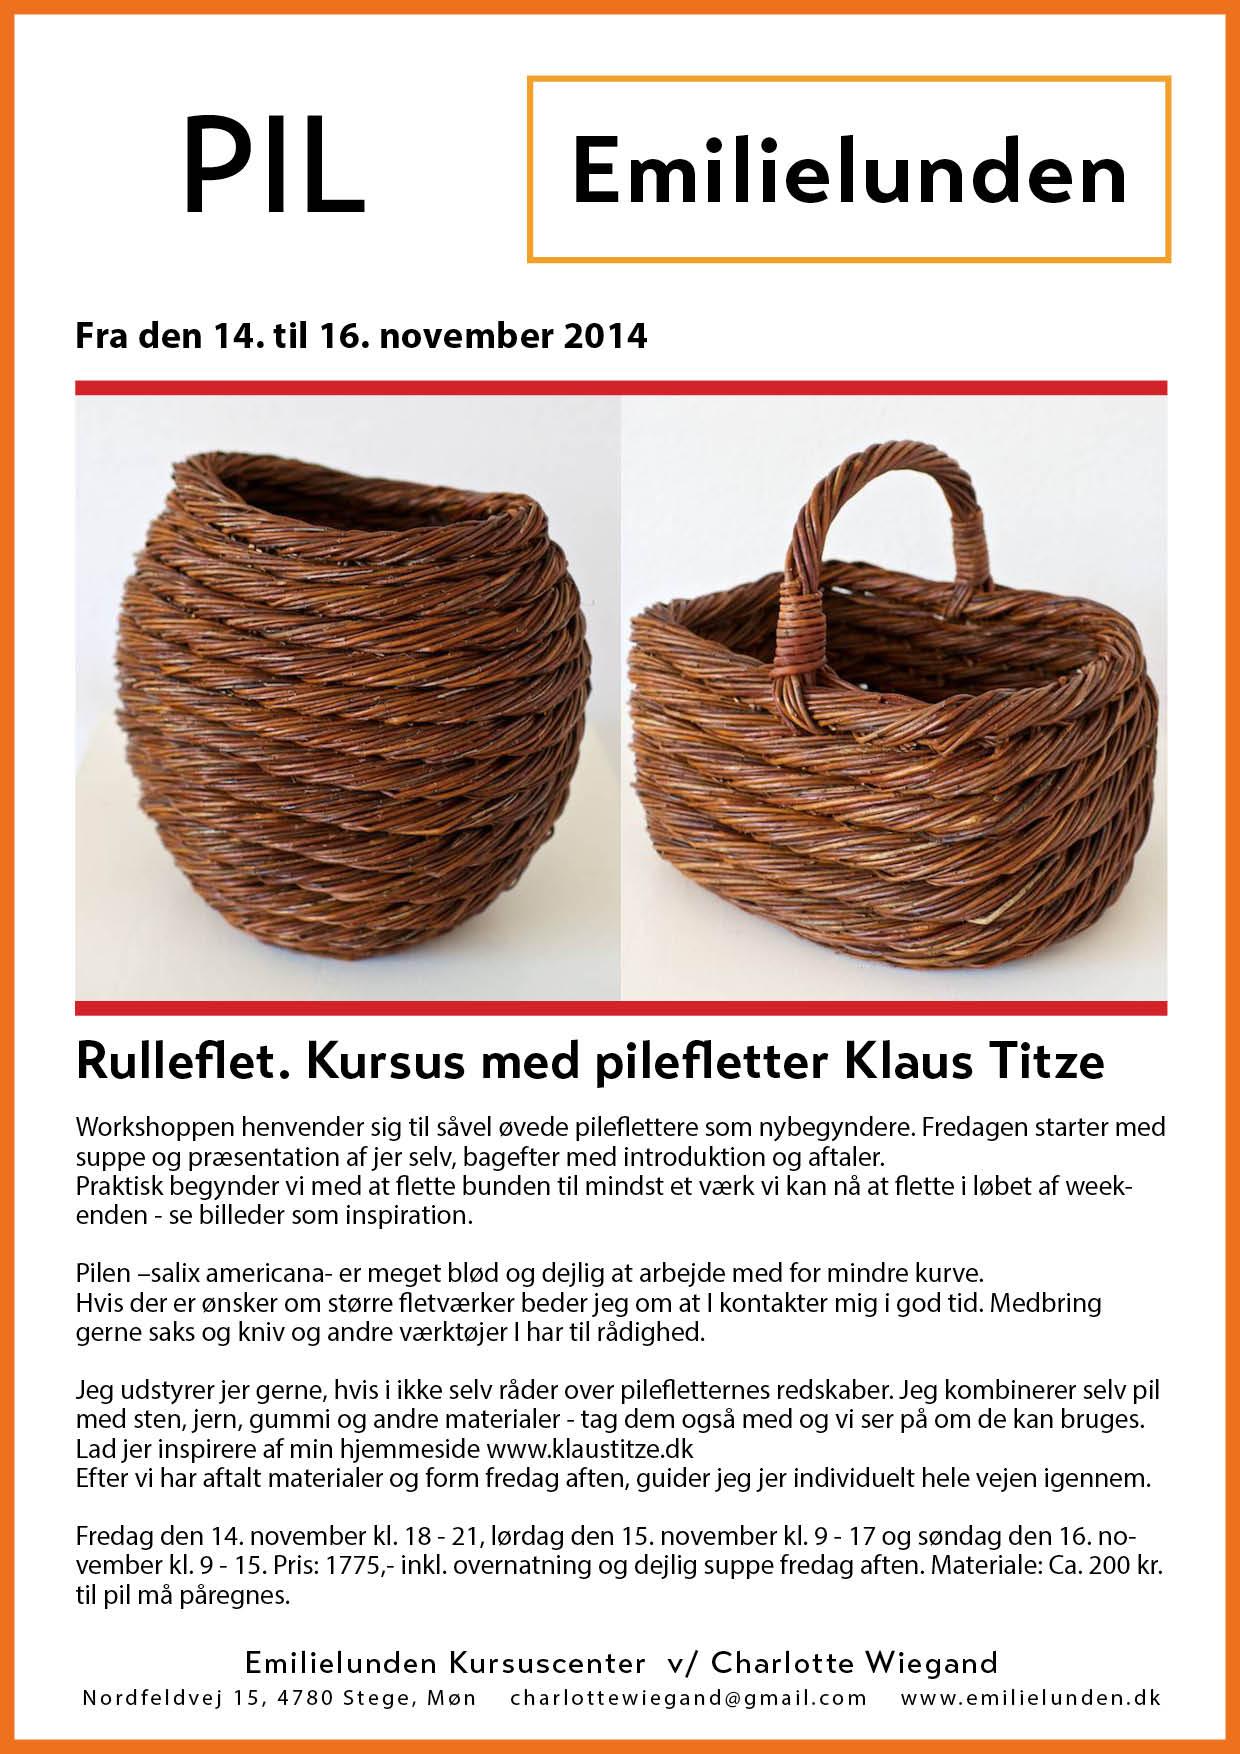 Titze2014_Emilielunden